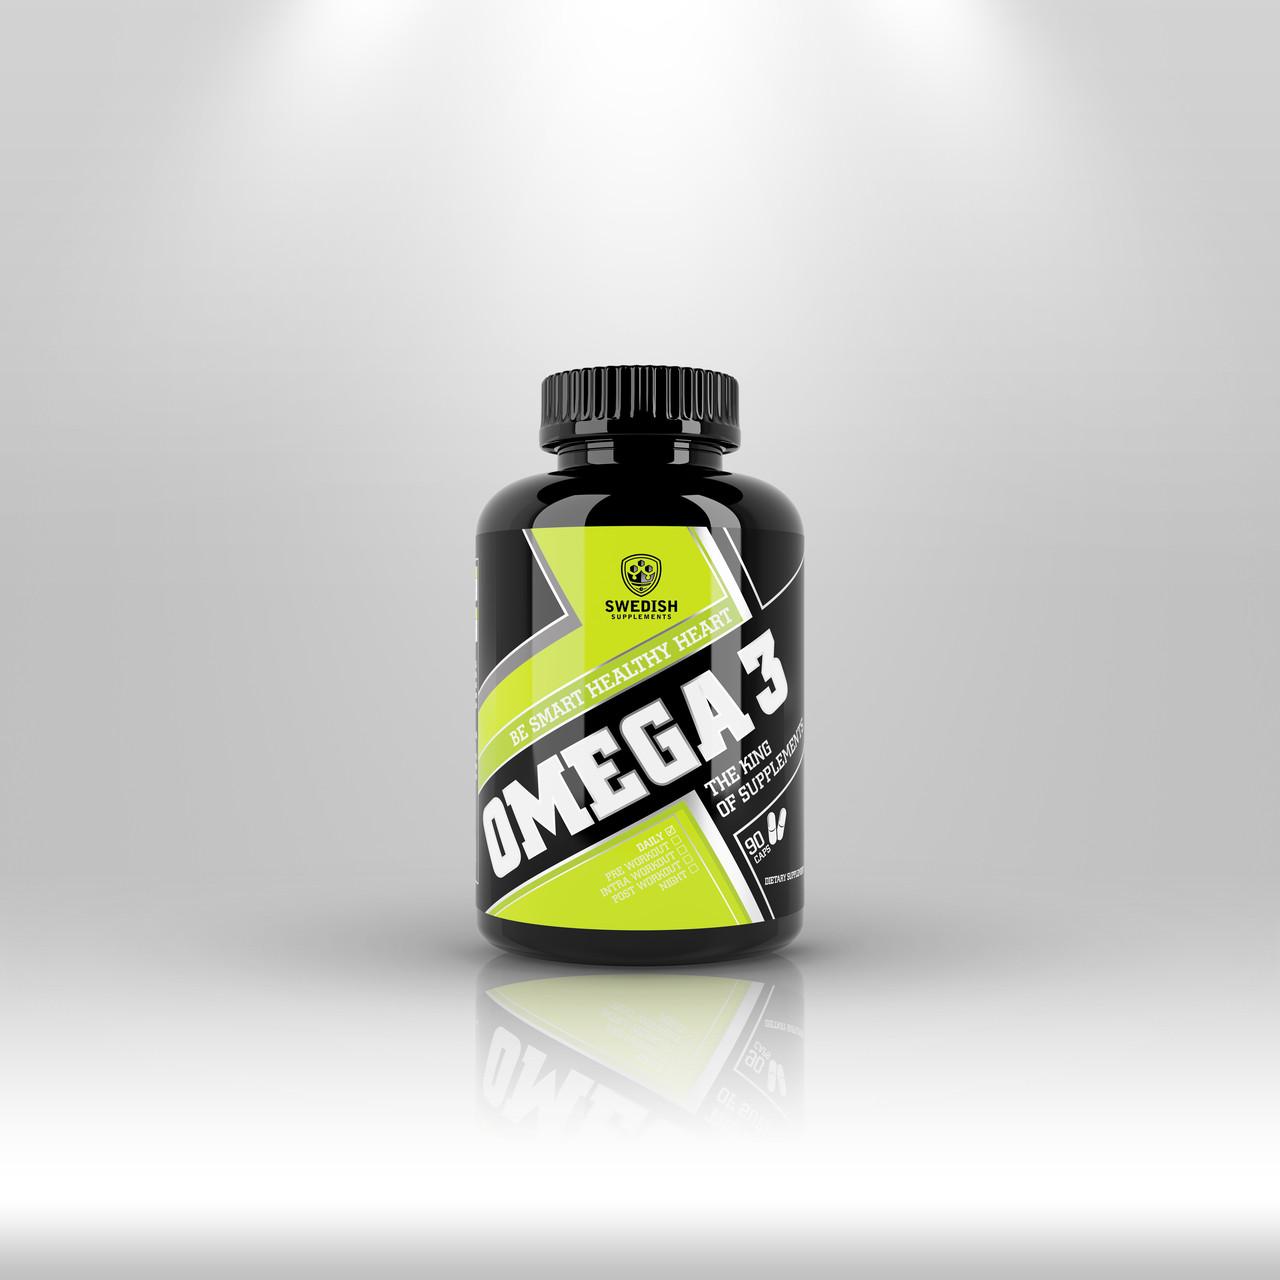 Swedish supplements - Omega 3 - 120 cap